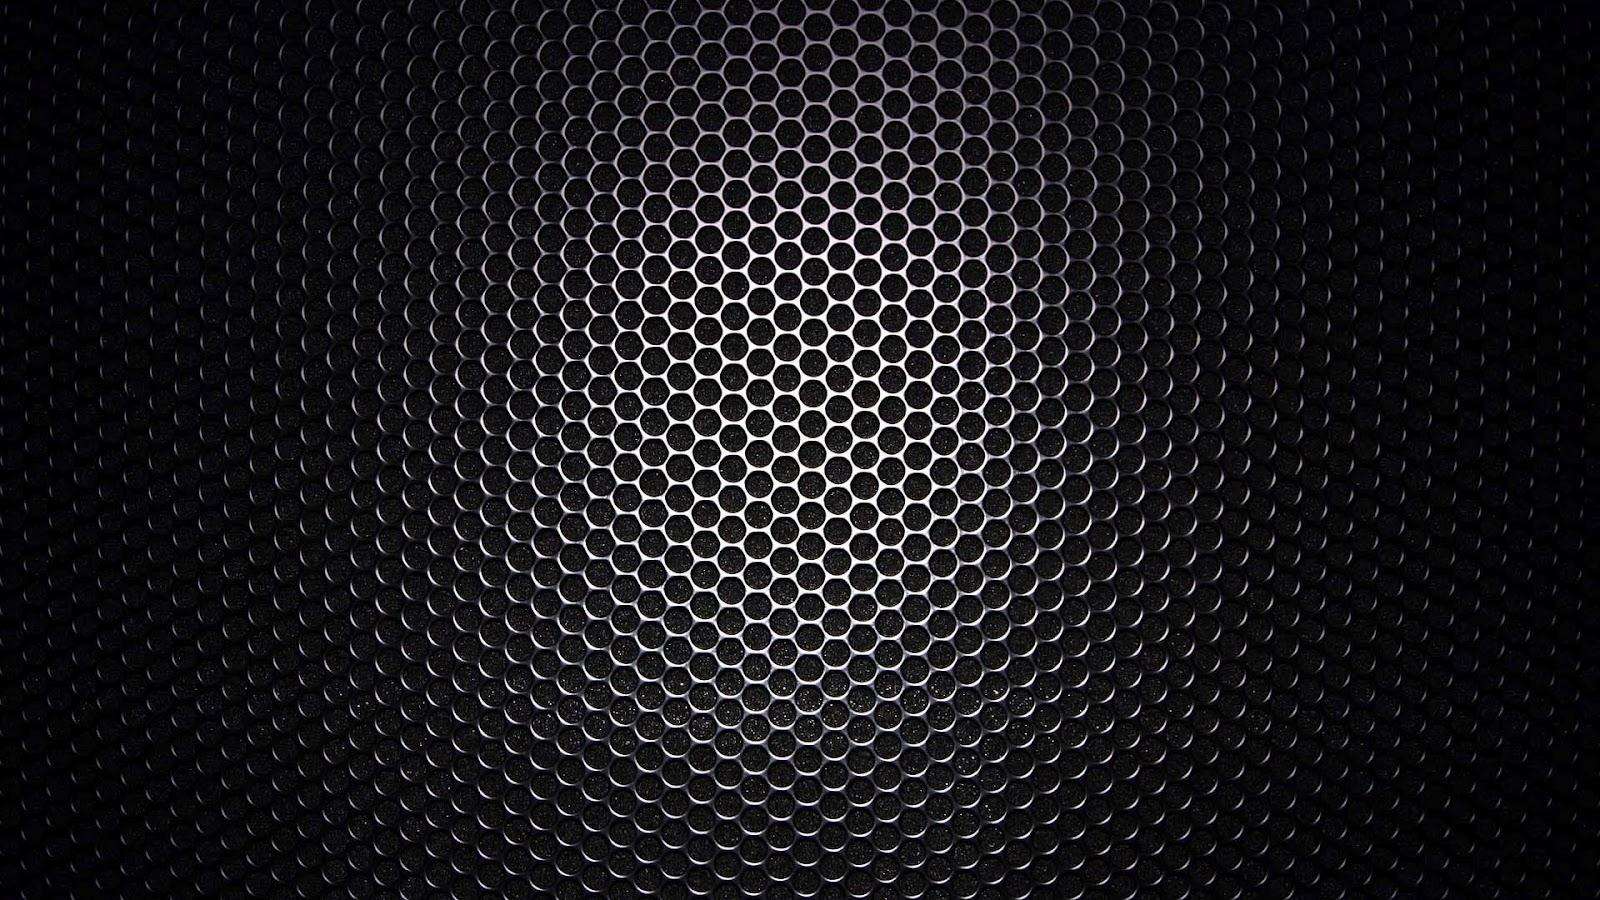 Black hd wallpaper 1920x1080 wallpapersafari - Dark background wallpaper hd ...